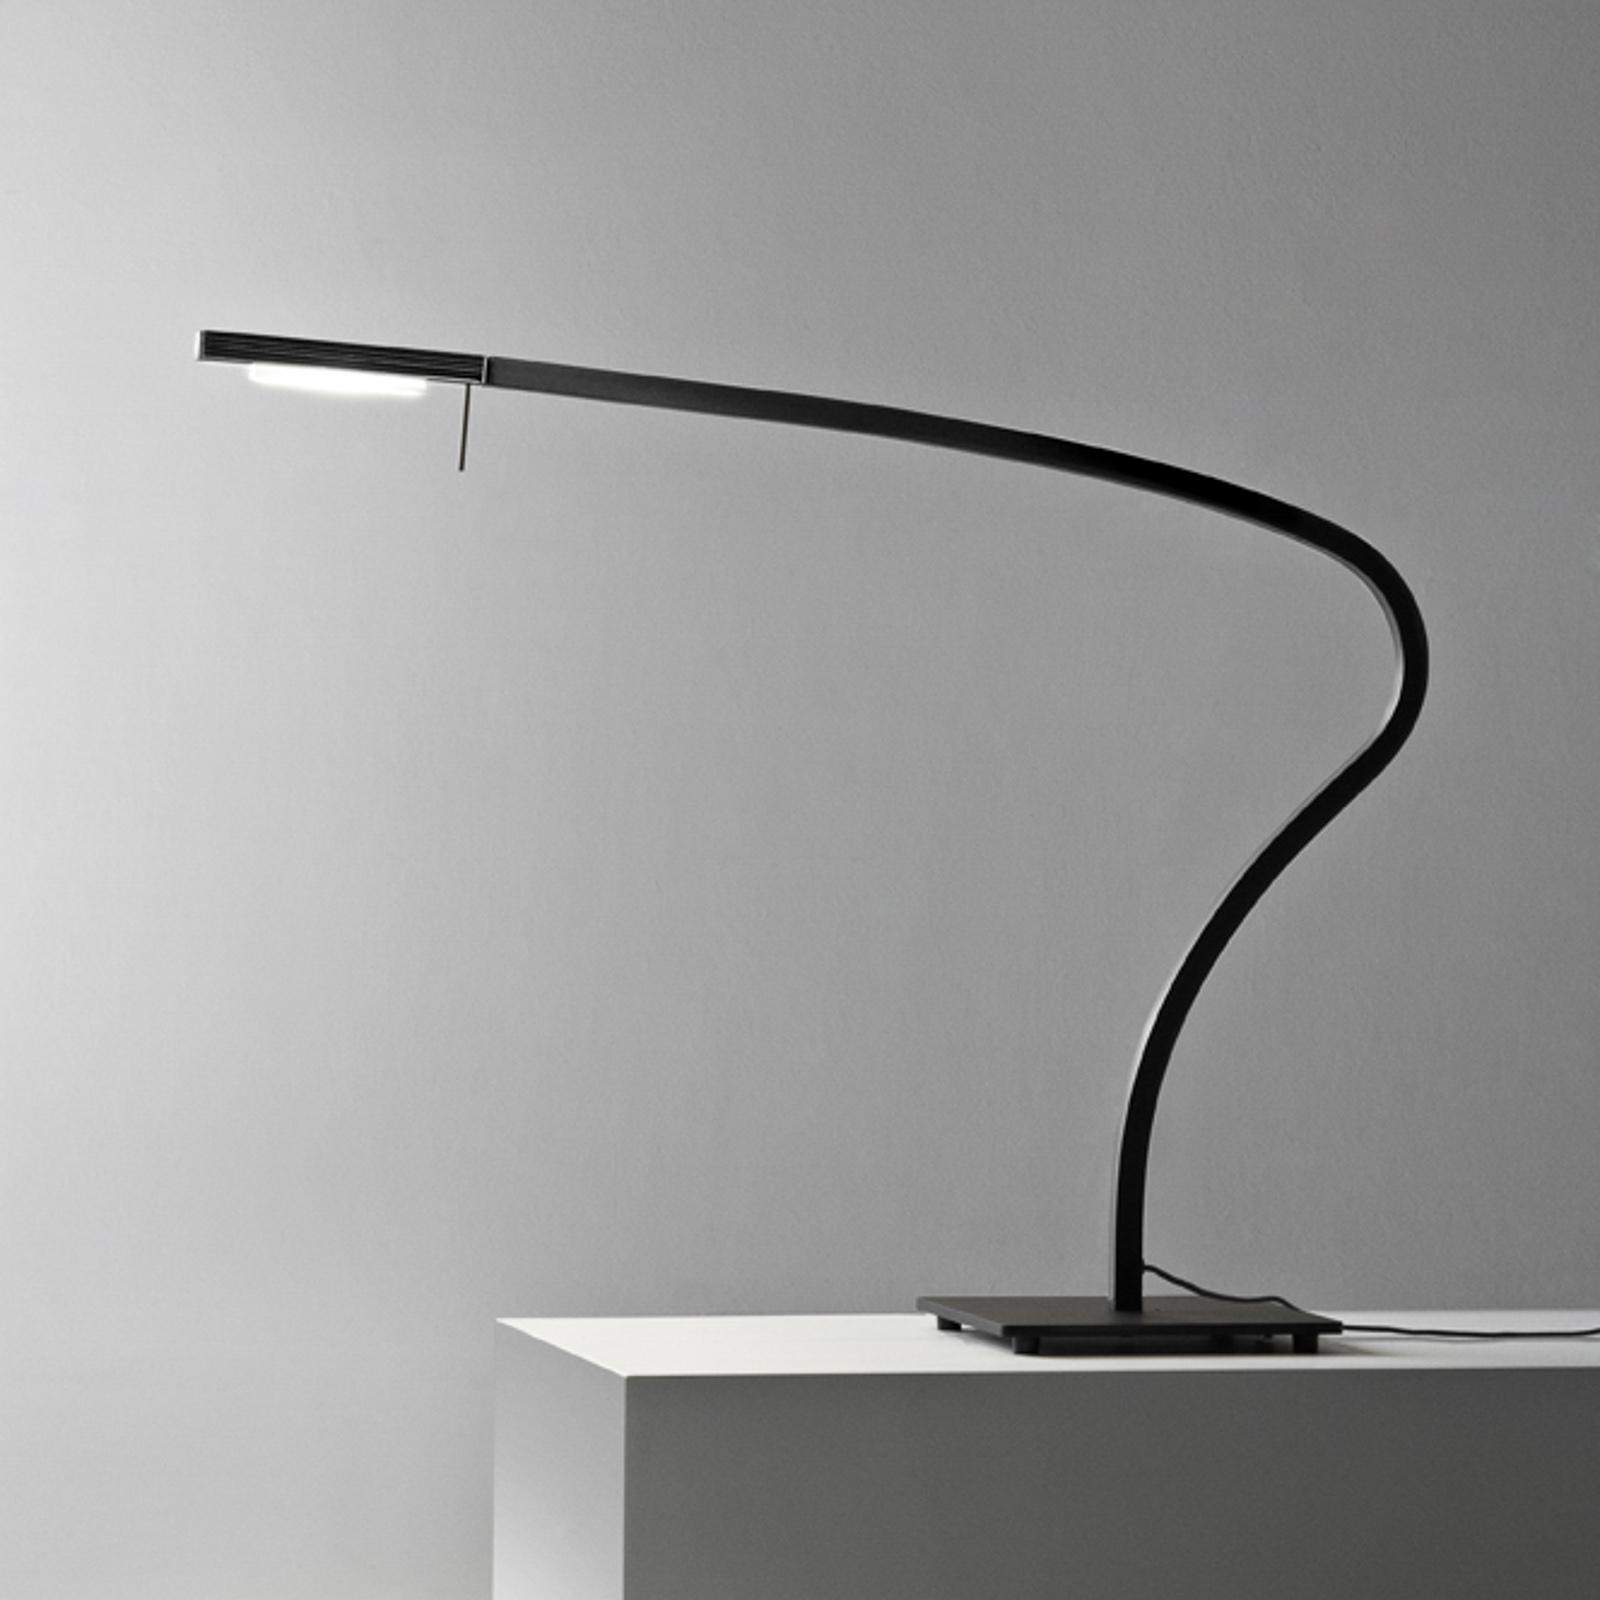 Prandina Paraph T3 LED-Tischlampe dimmbar schwarz